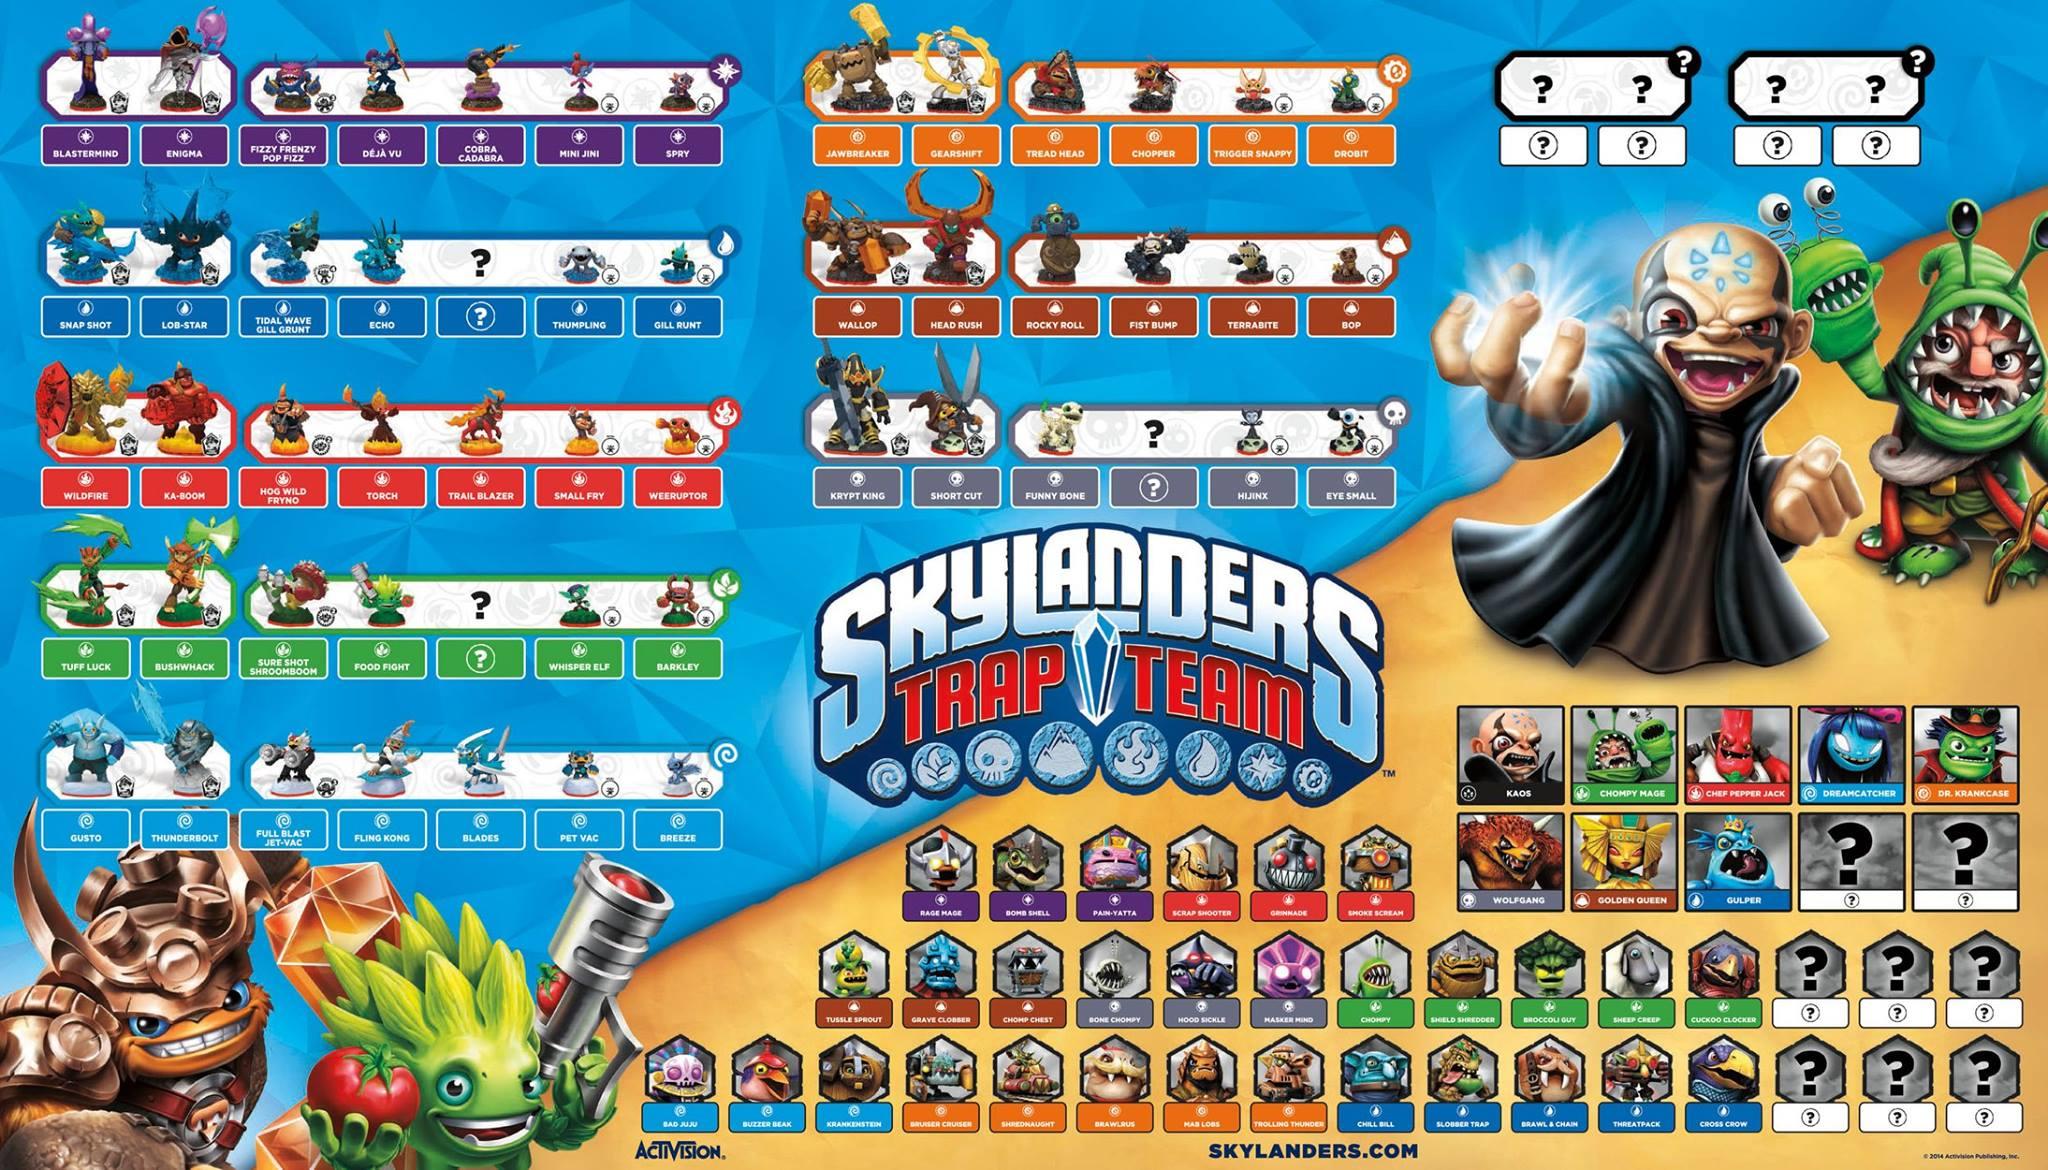 Full Skylanders Trap Team List